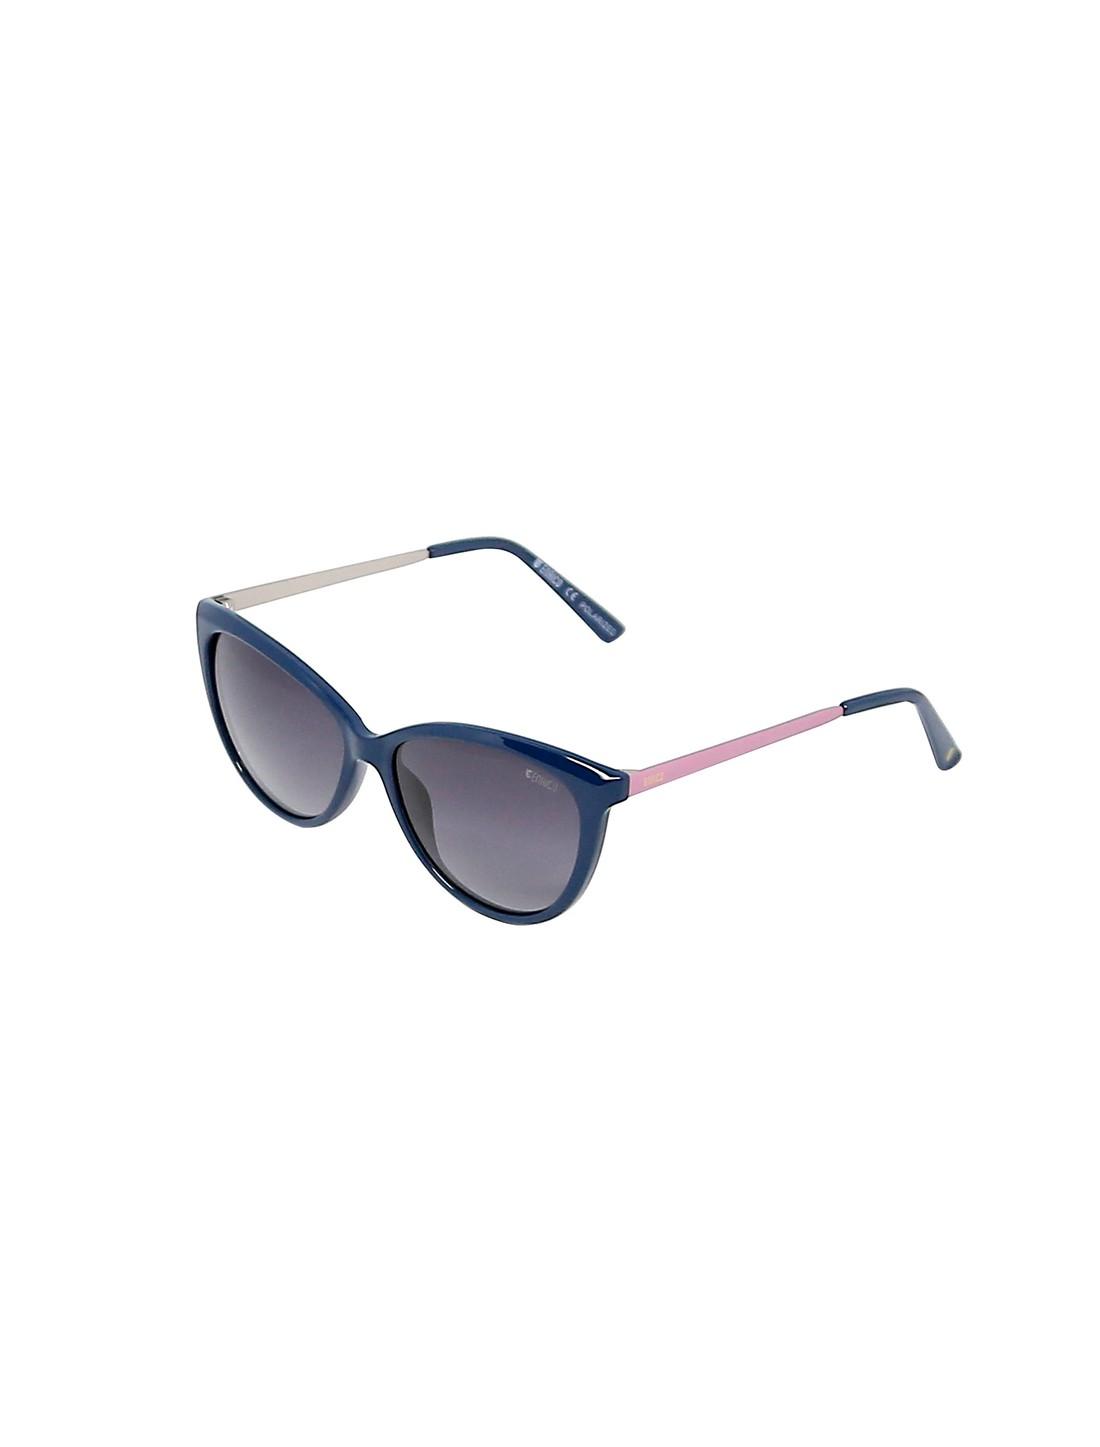 ENRICO | ENRICO Rylen Classic Designer UV Protected Cateye Sunglasses for Women ( Lens - Grey | Frame - Blue)